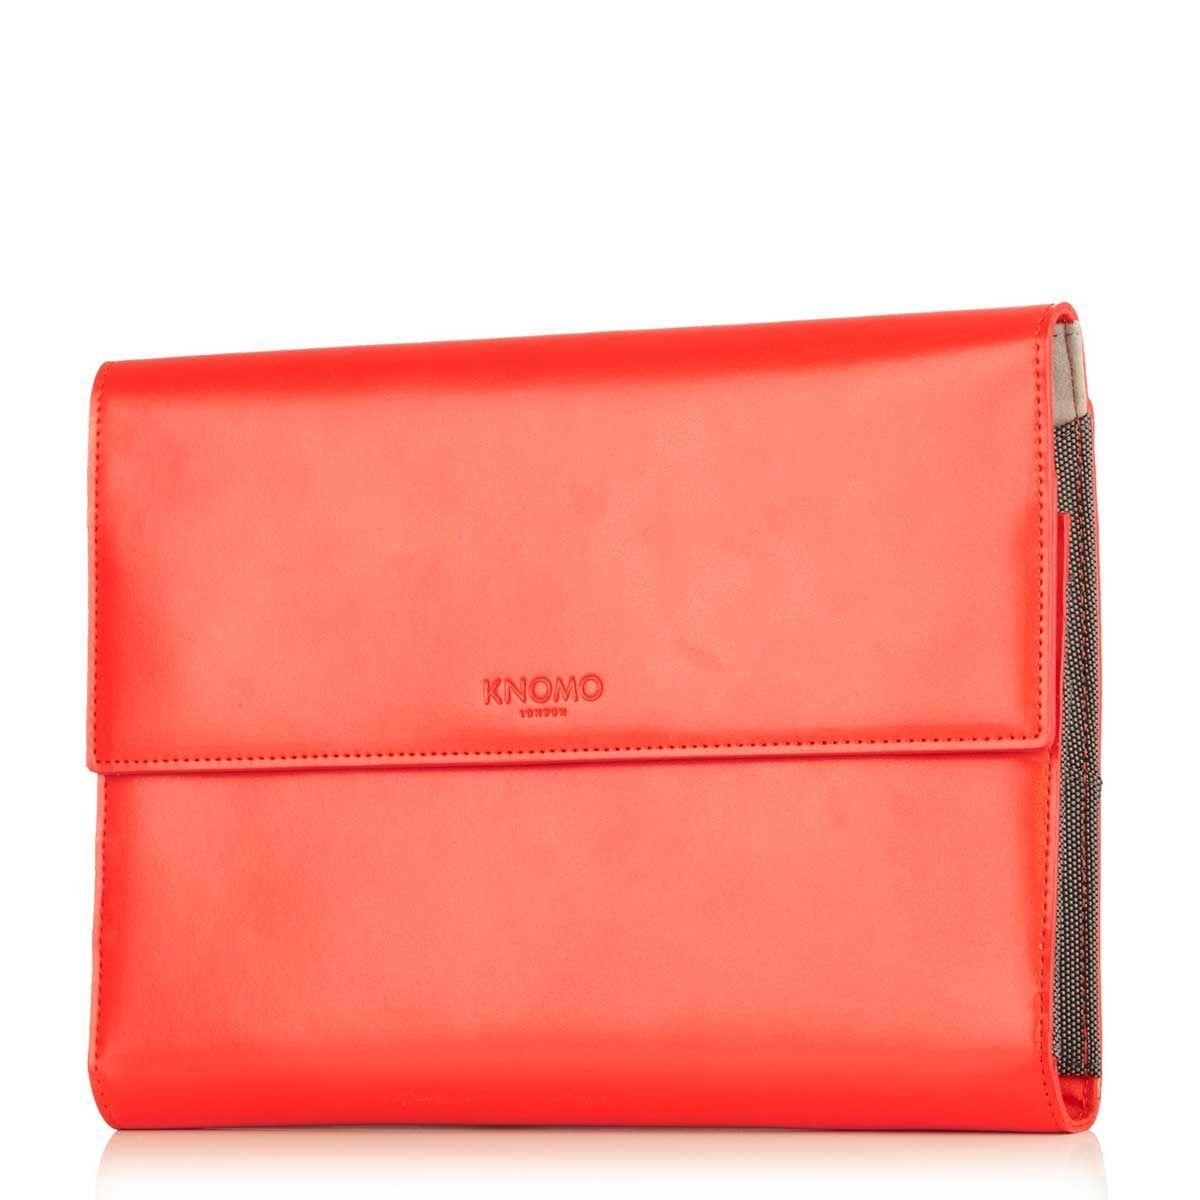 iPad hoes Knomo Knomad iPad Mini Leather Tomato